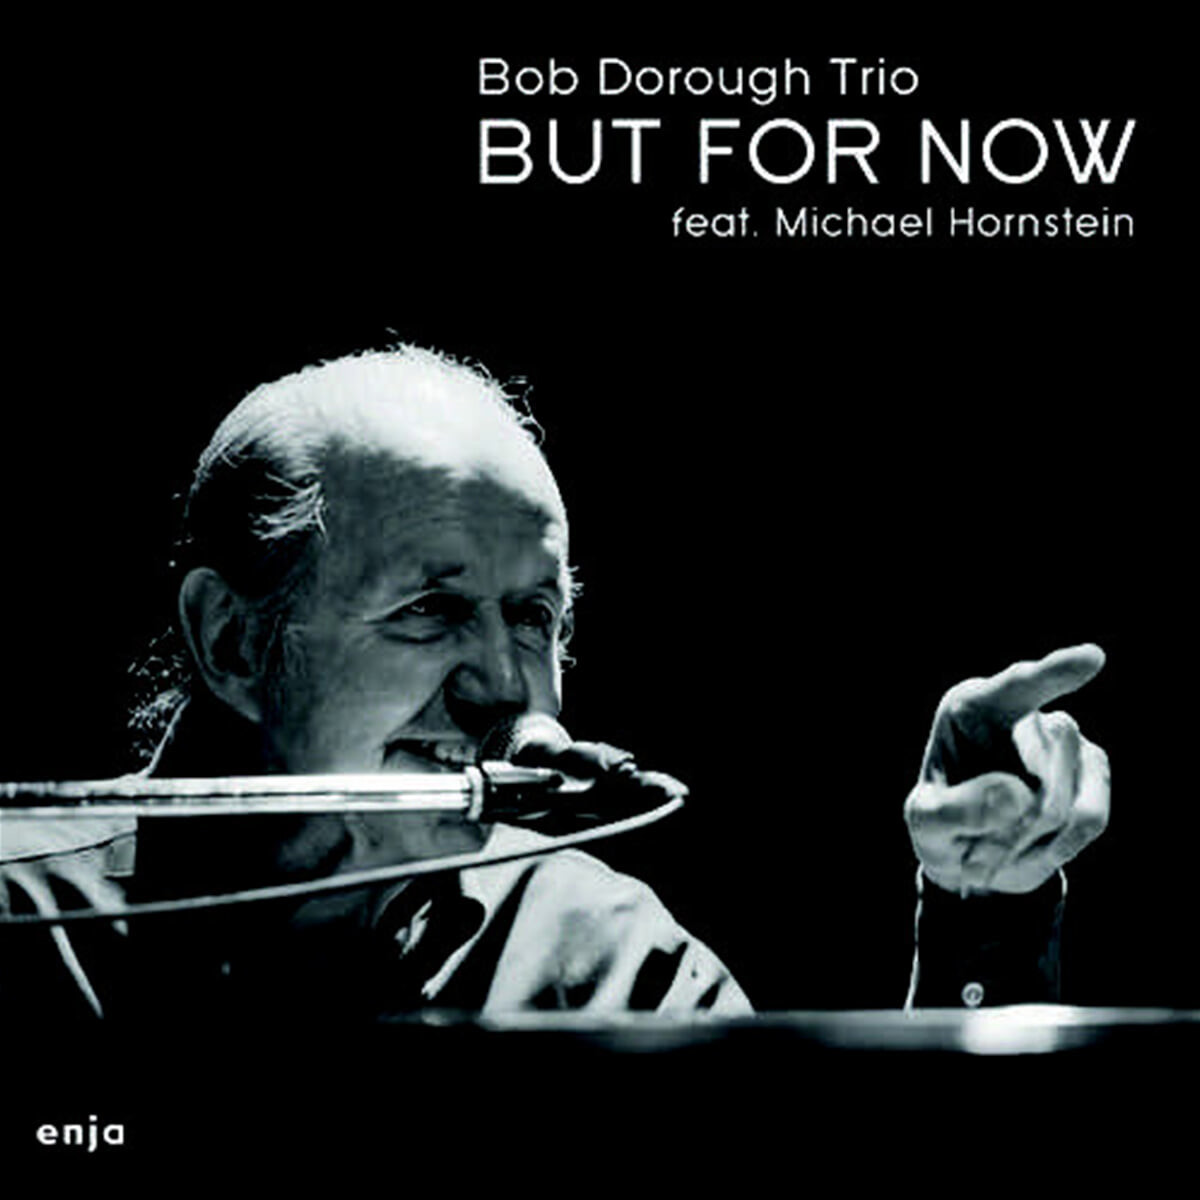 Bob Dorough Trio (밥 도라우 트리오) - But For Now